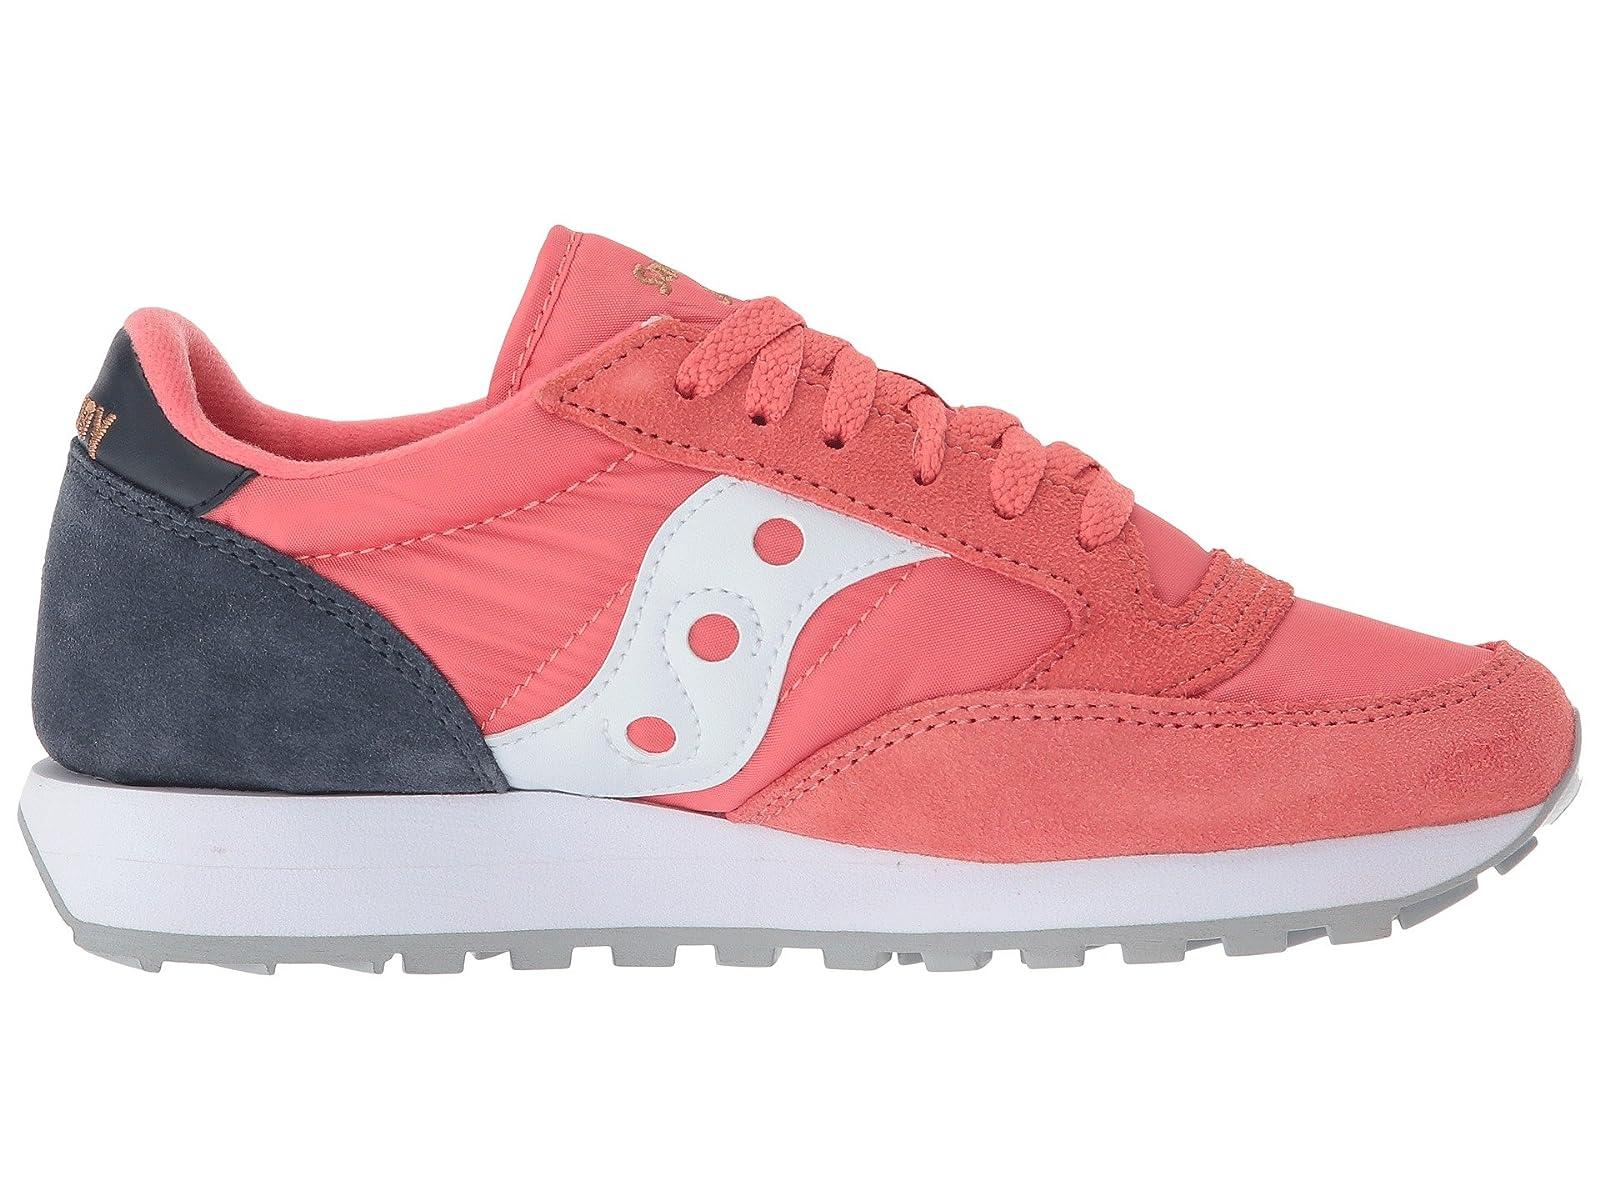 Woman-039-s-Sneakers-amp-Athletic-Shoes-Saucony-Originals-Jazz-Original thumbnail 28